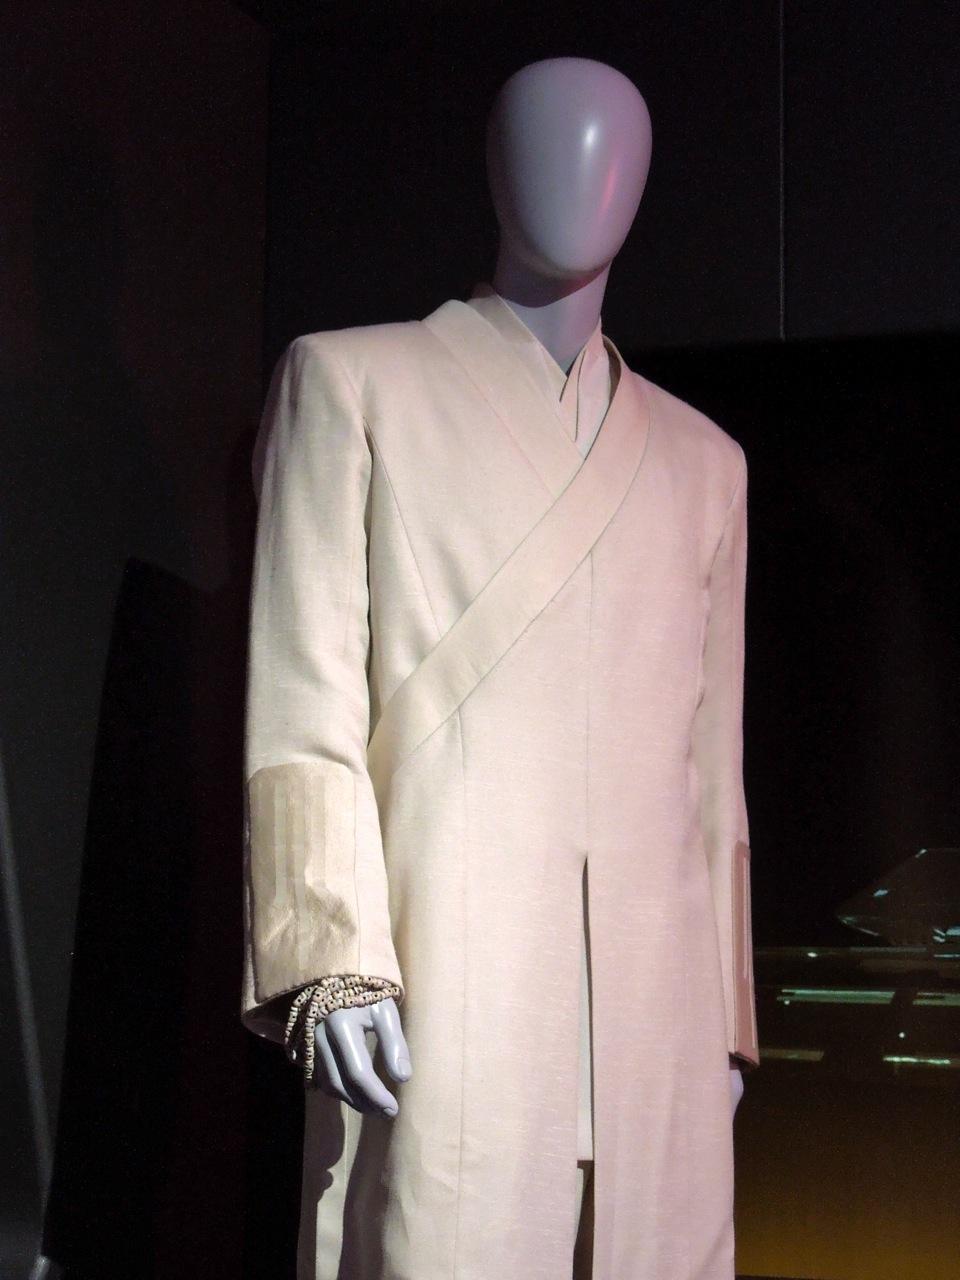 Tron Legacy Kevin Flynn costume & Kevin Flynn costume worn by Jeff Bridges in Tron Legacy ...